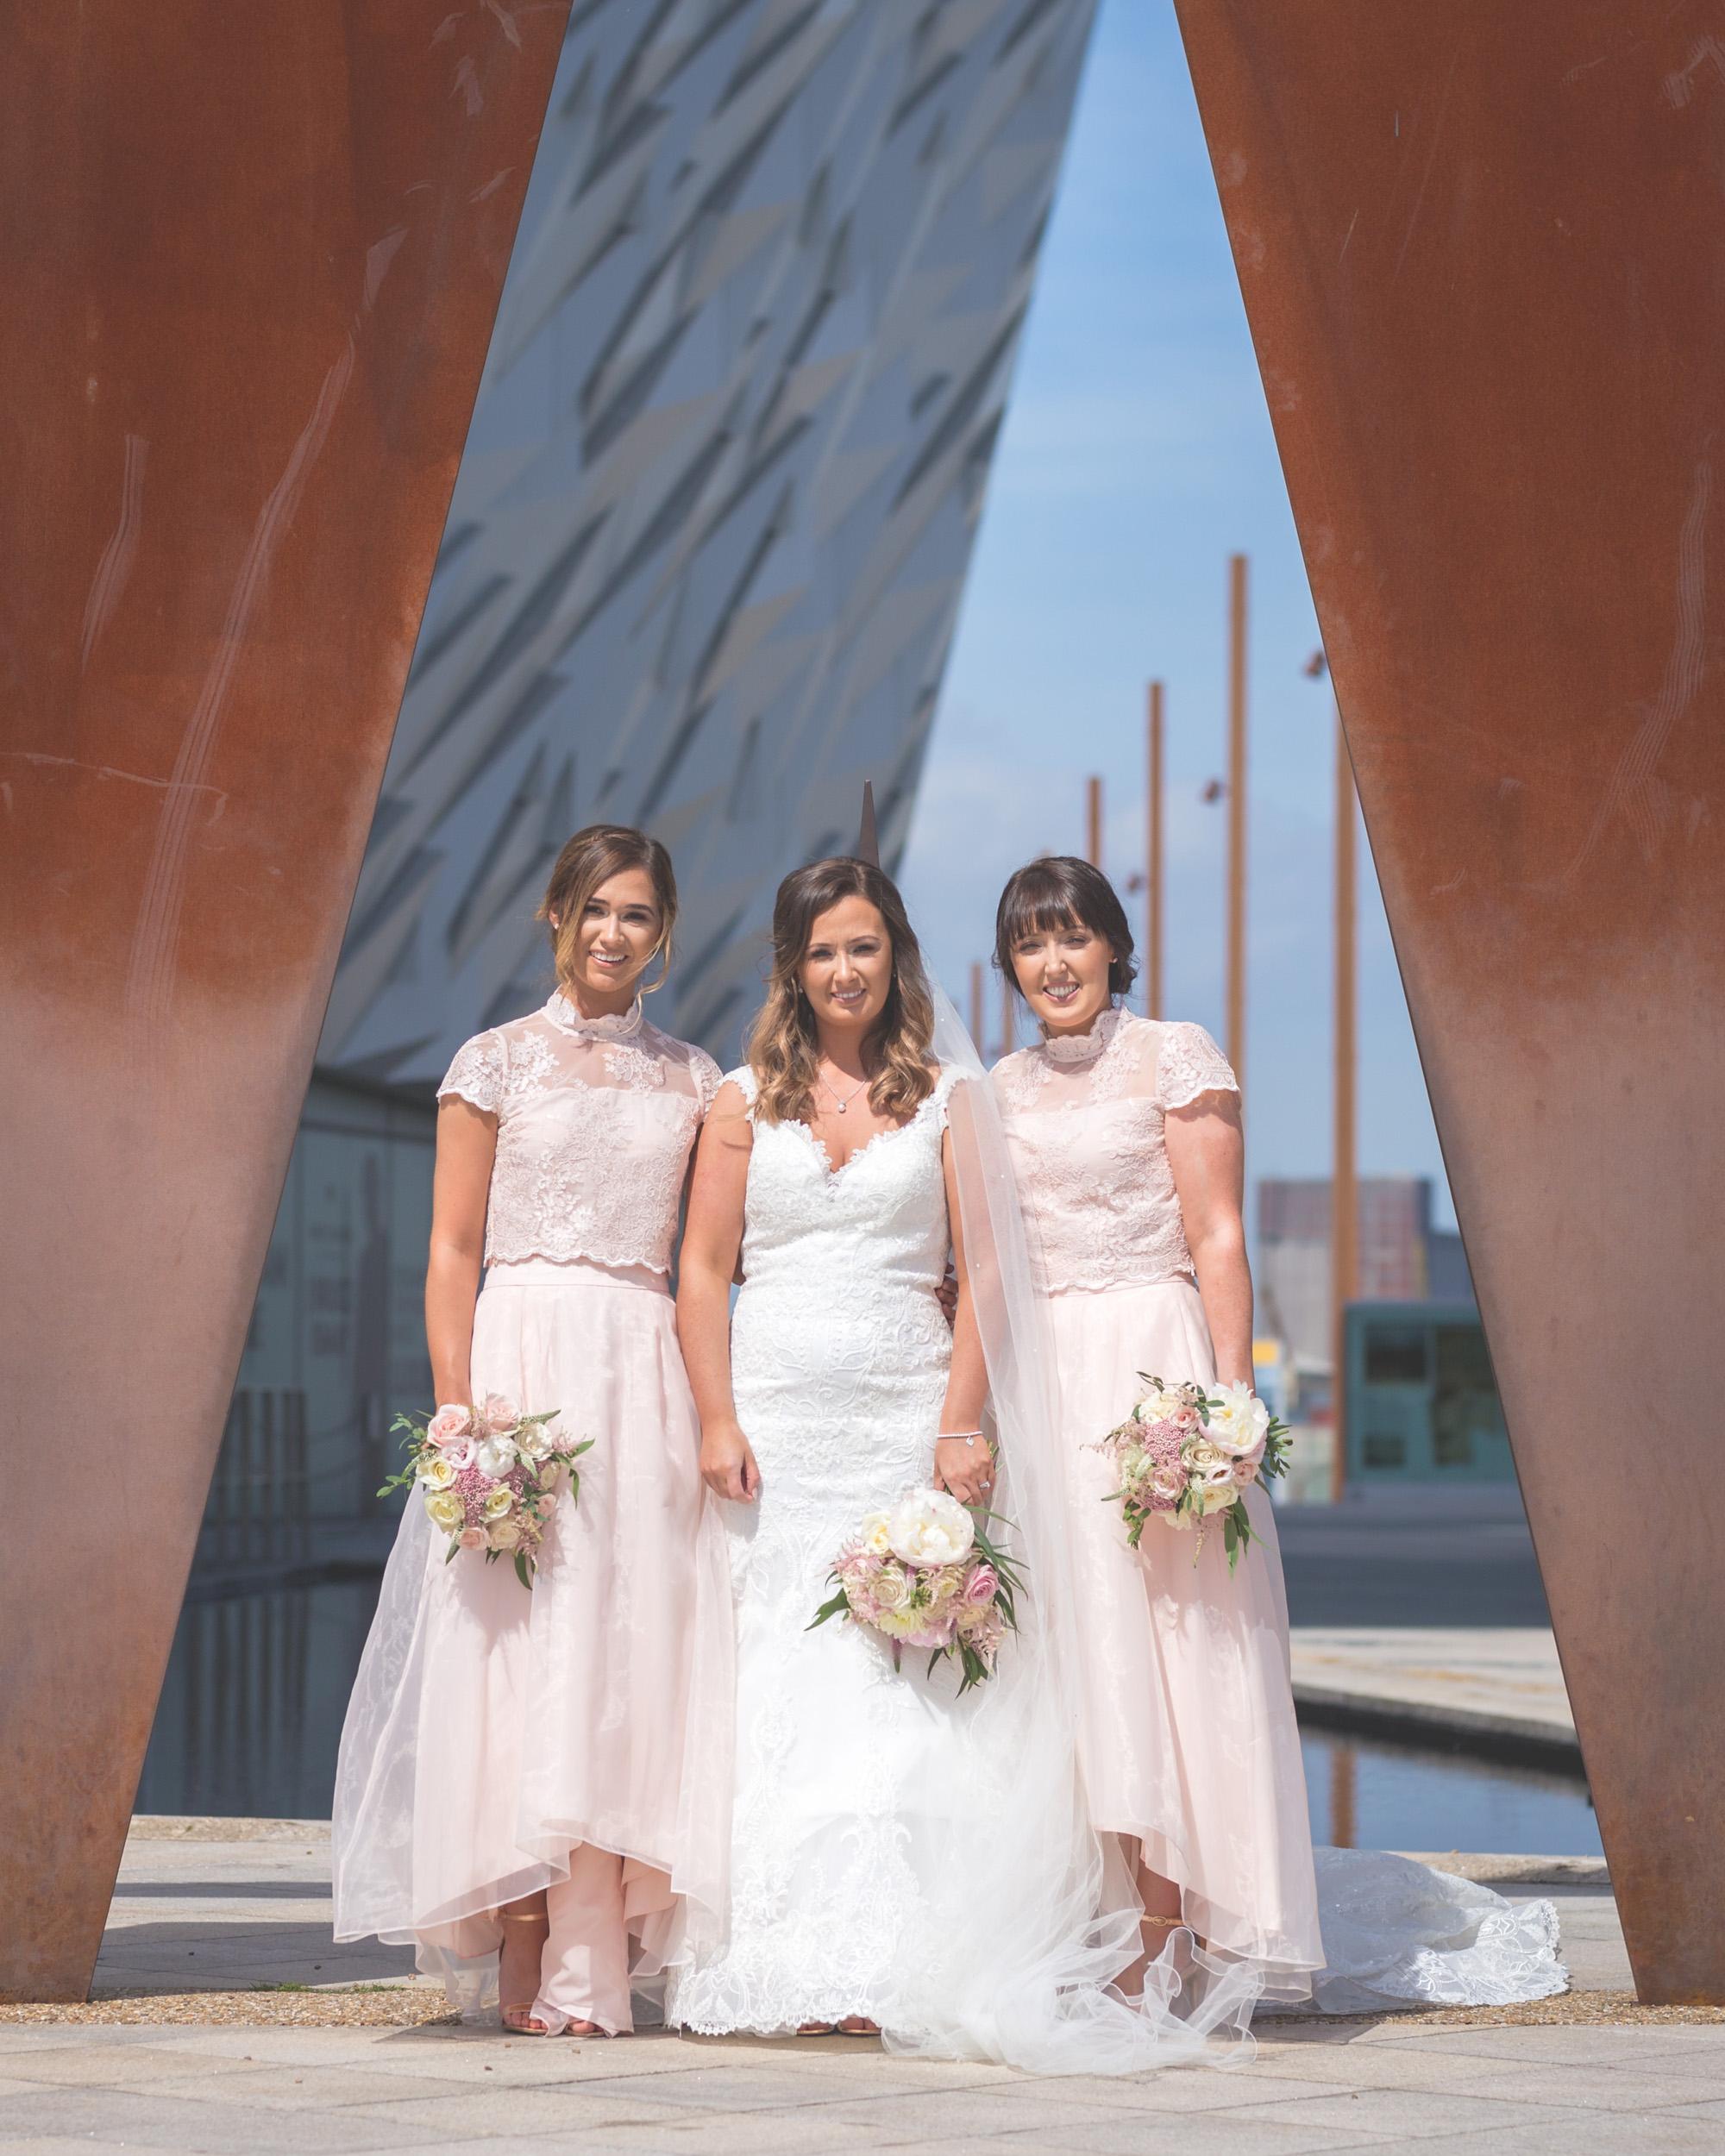 Brian McEwan   Northern Ireland Wedding Photographer   Rebecca & Michael   Portraits-64.jpg